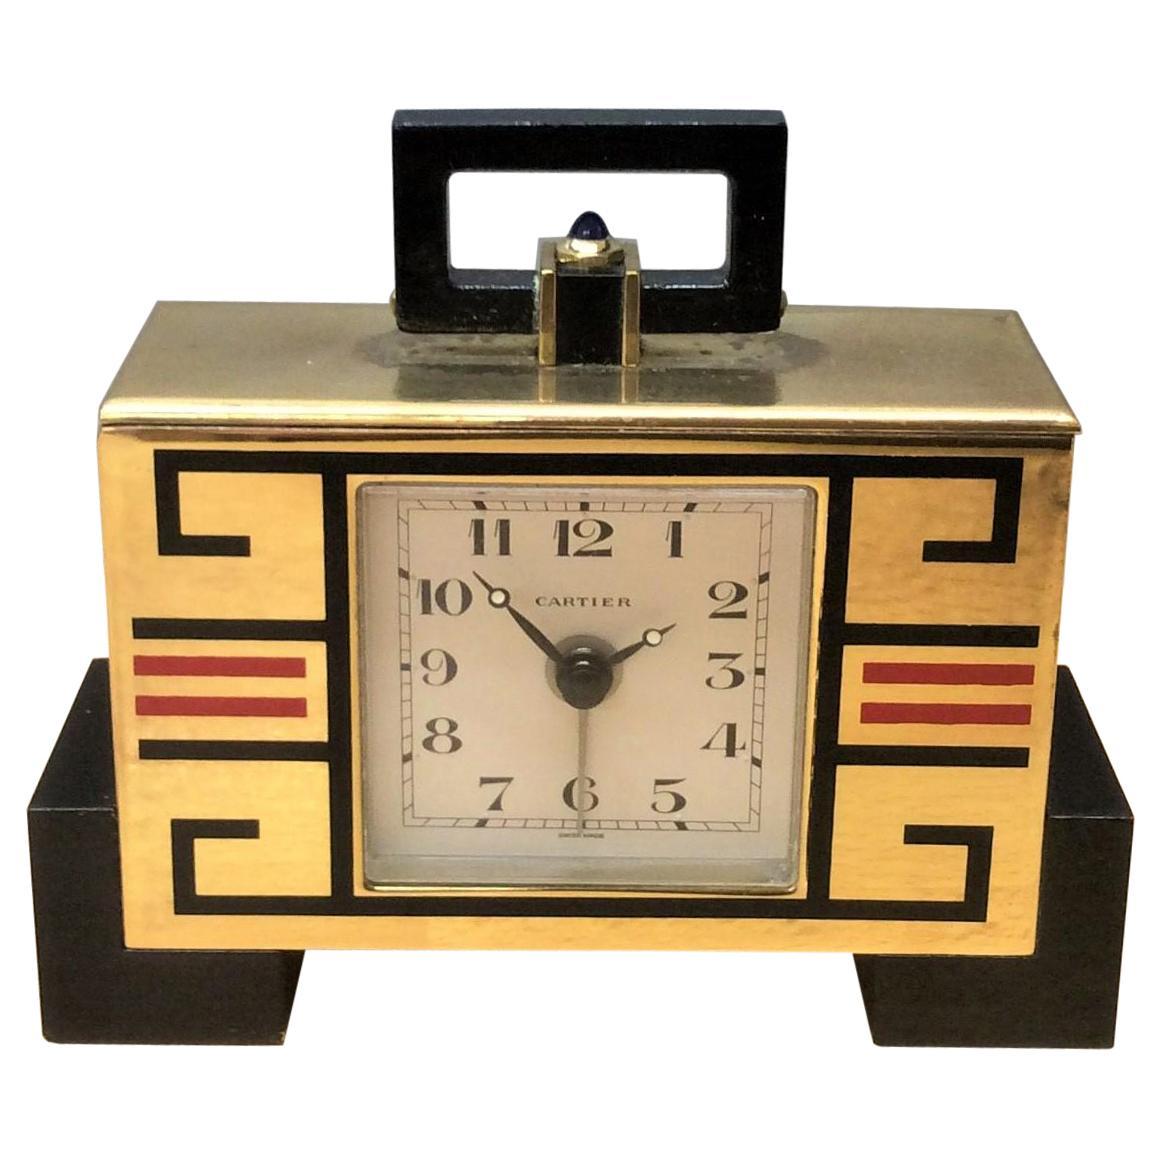 Art Deco 'cubist' Travel Clock by Cartier